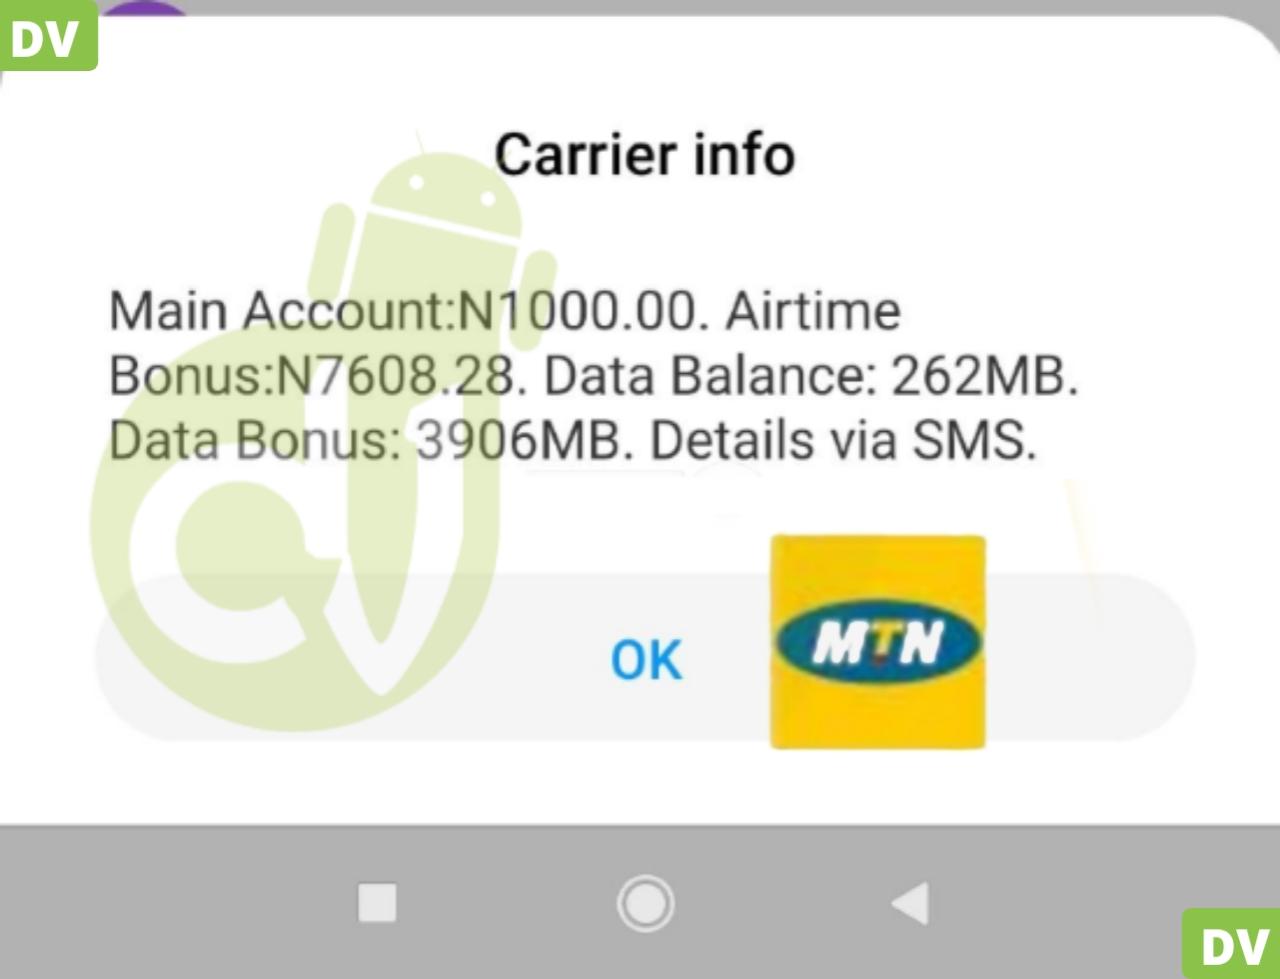 mtn free 3.5gb data